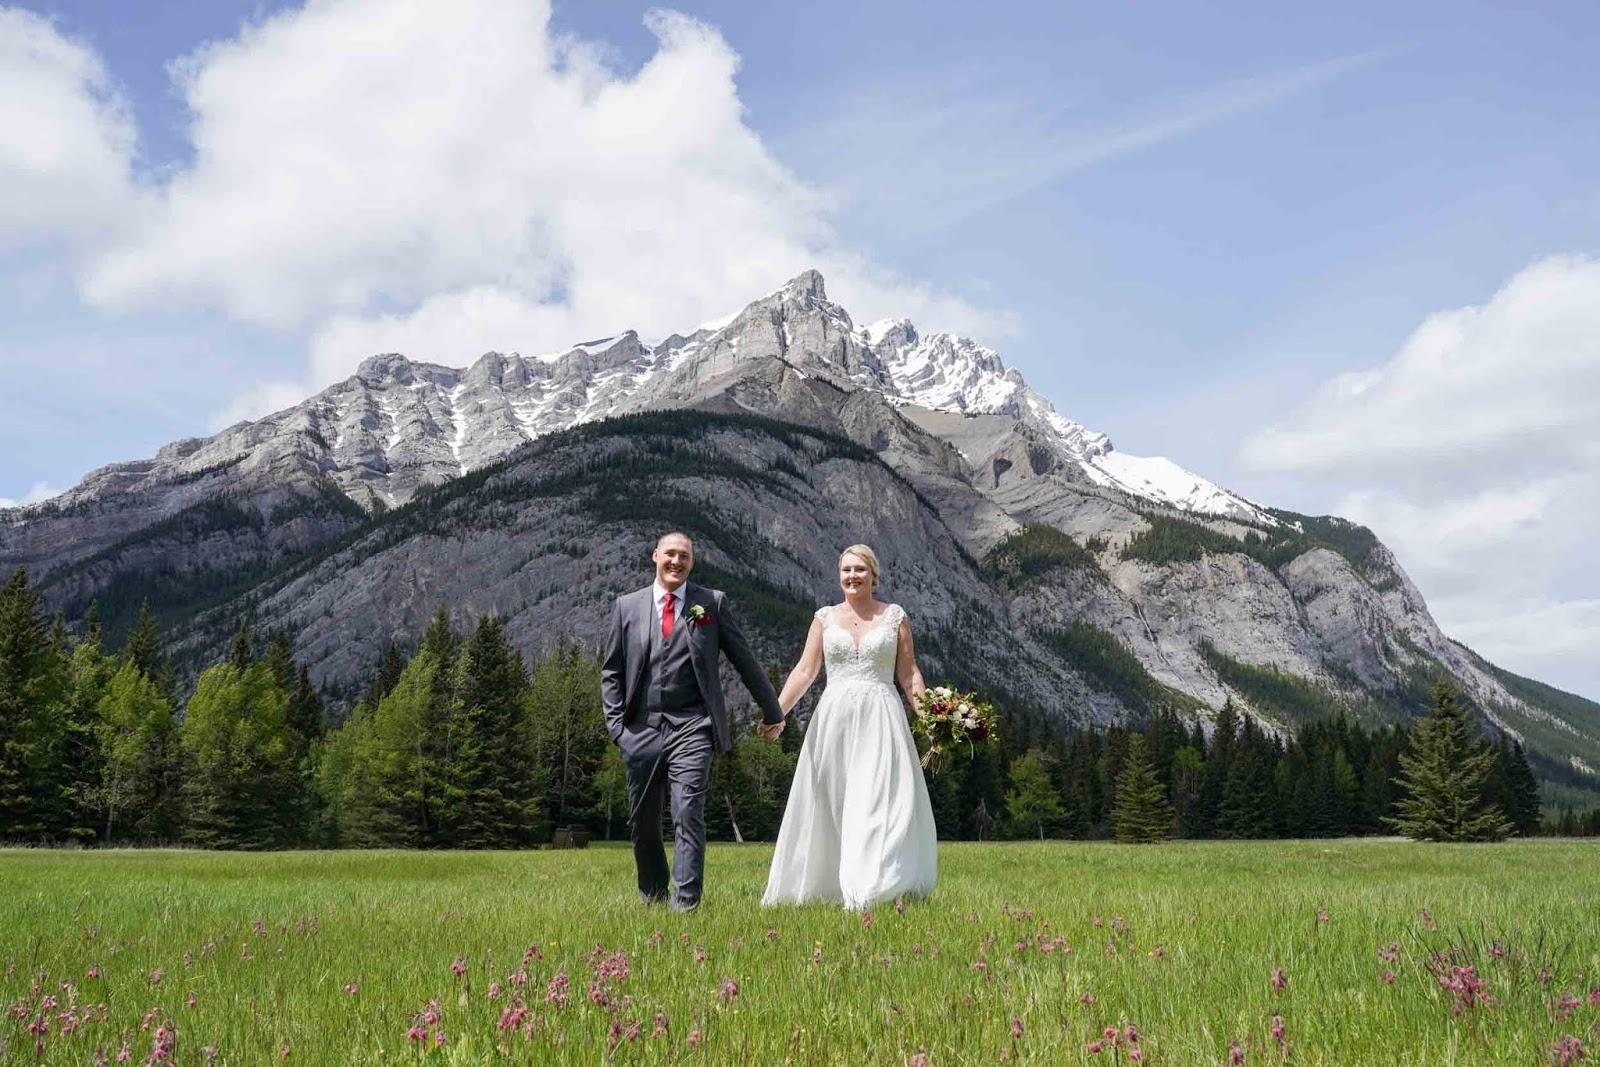 Summer Elopement in Banff